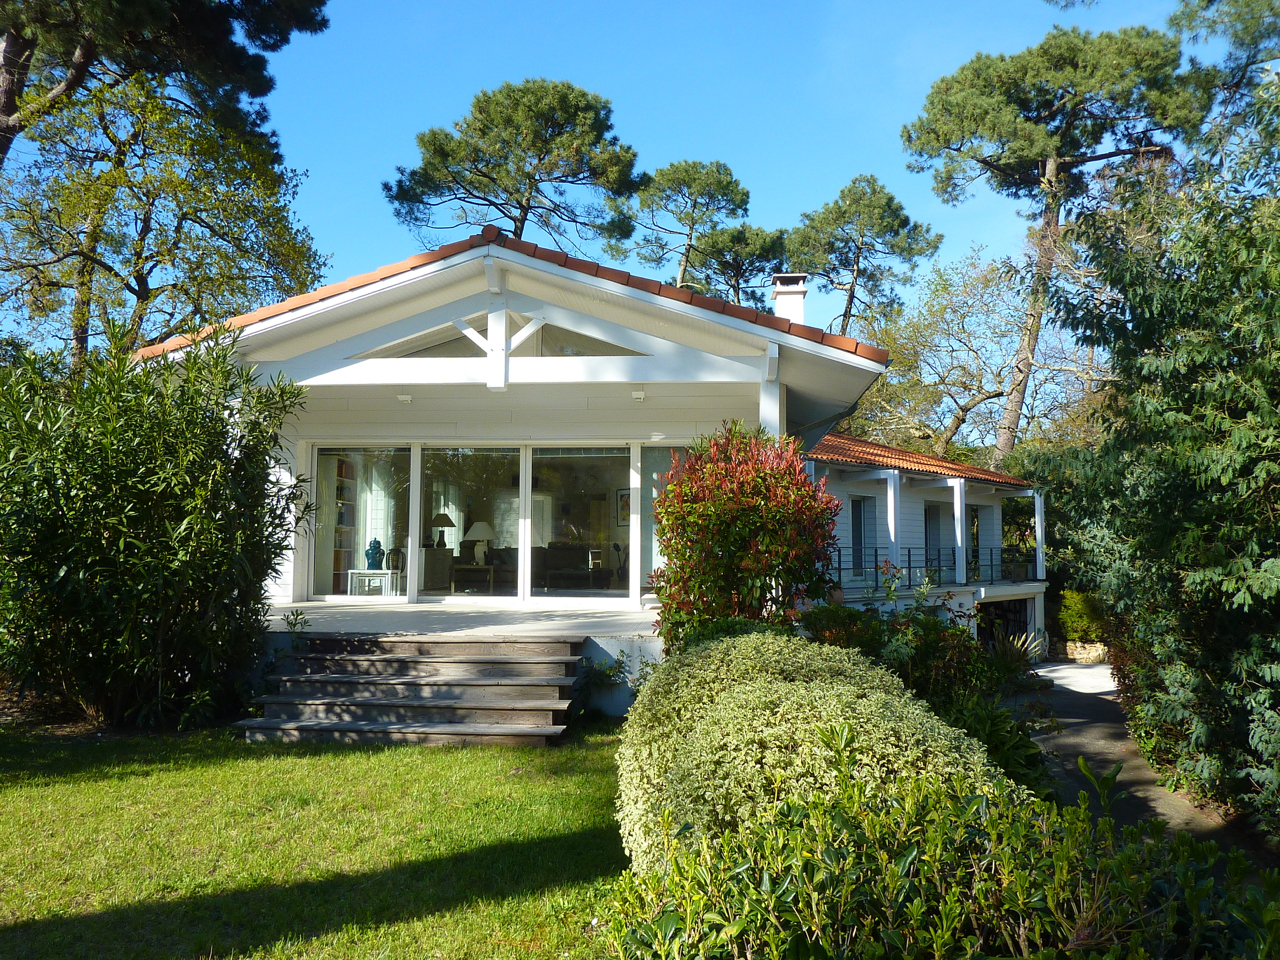 Acheter une villa arcachon barnes bassin d 39 arcachon for Acheter une villa